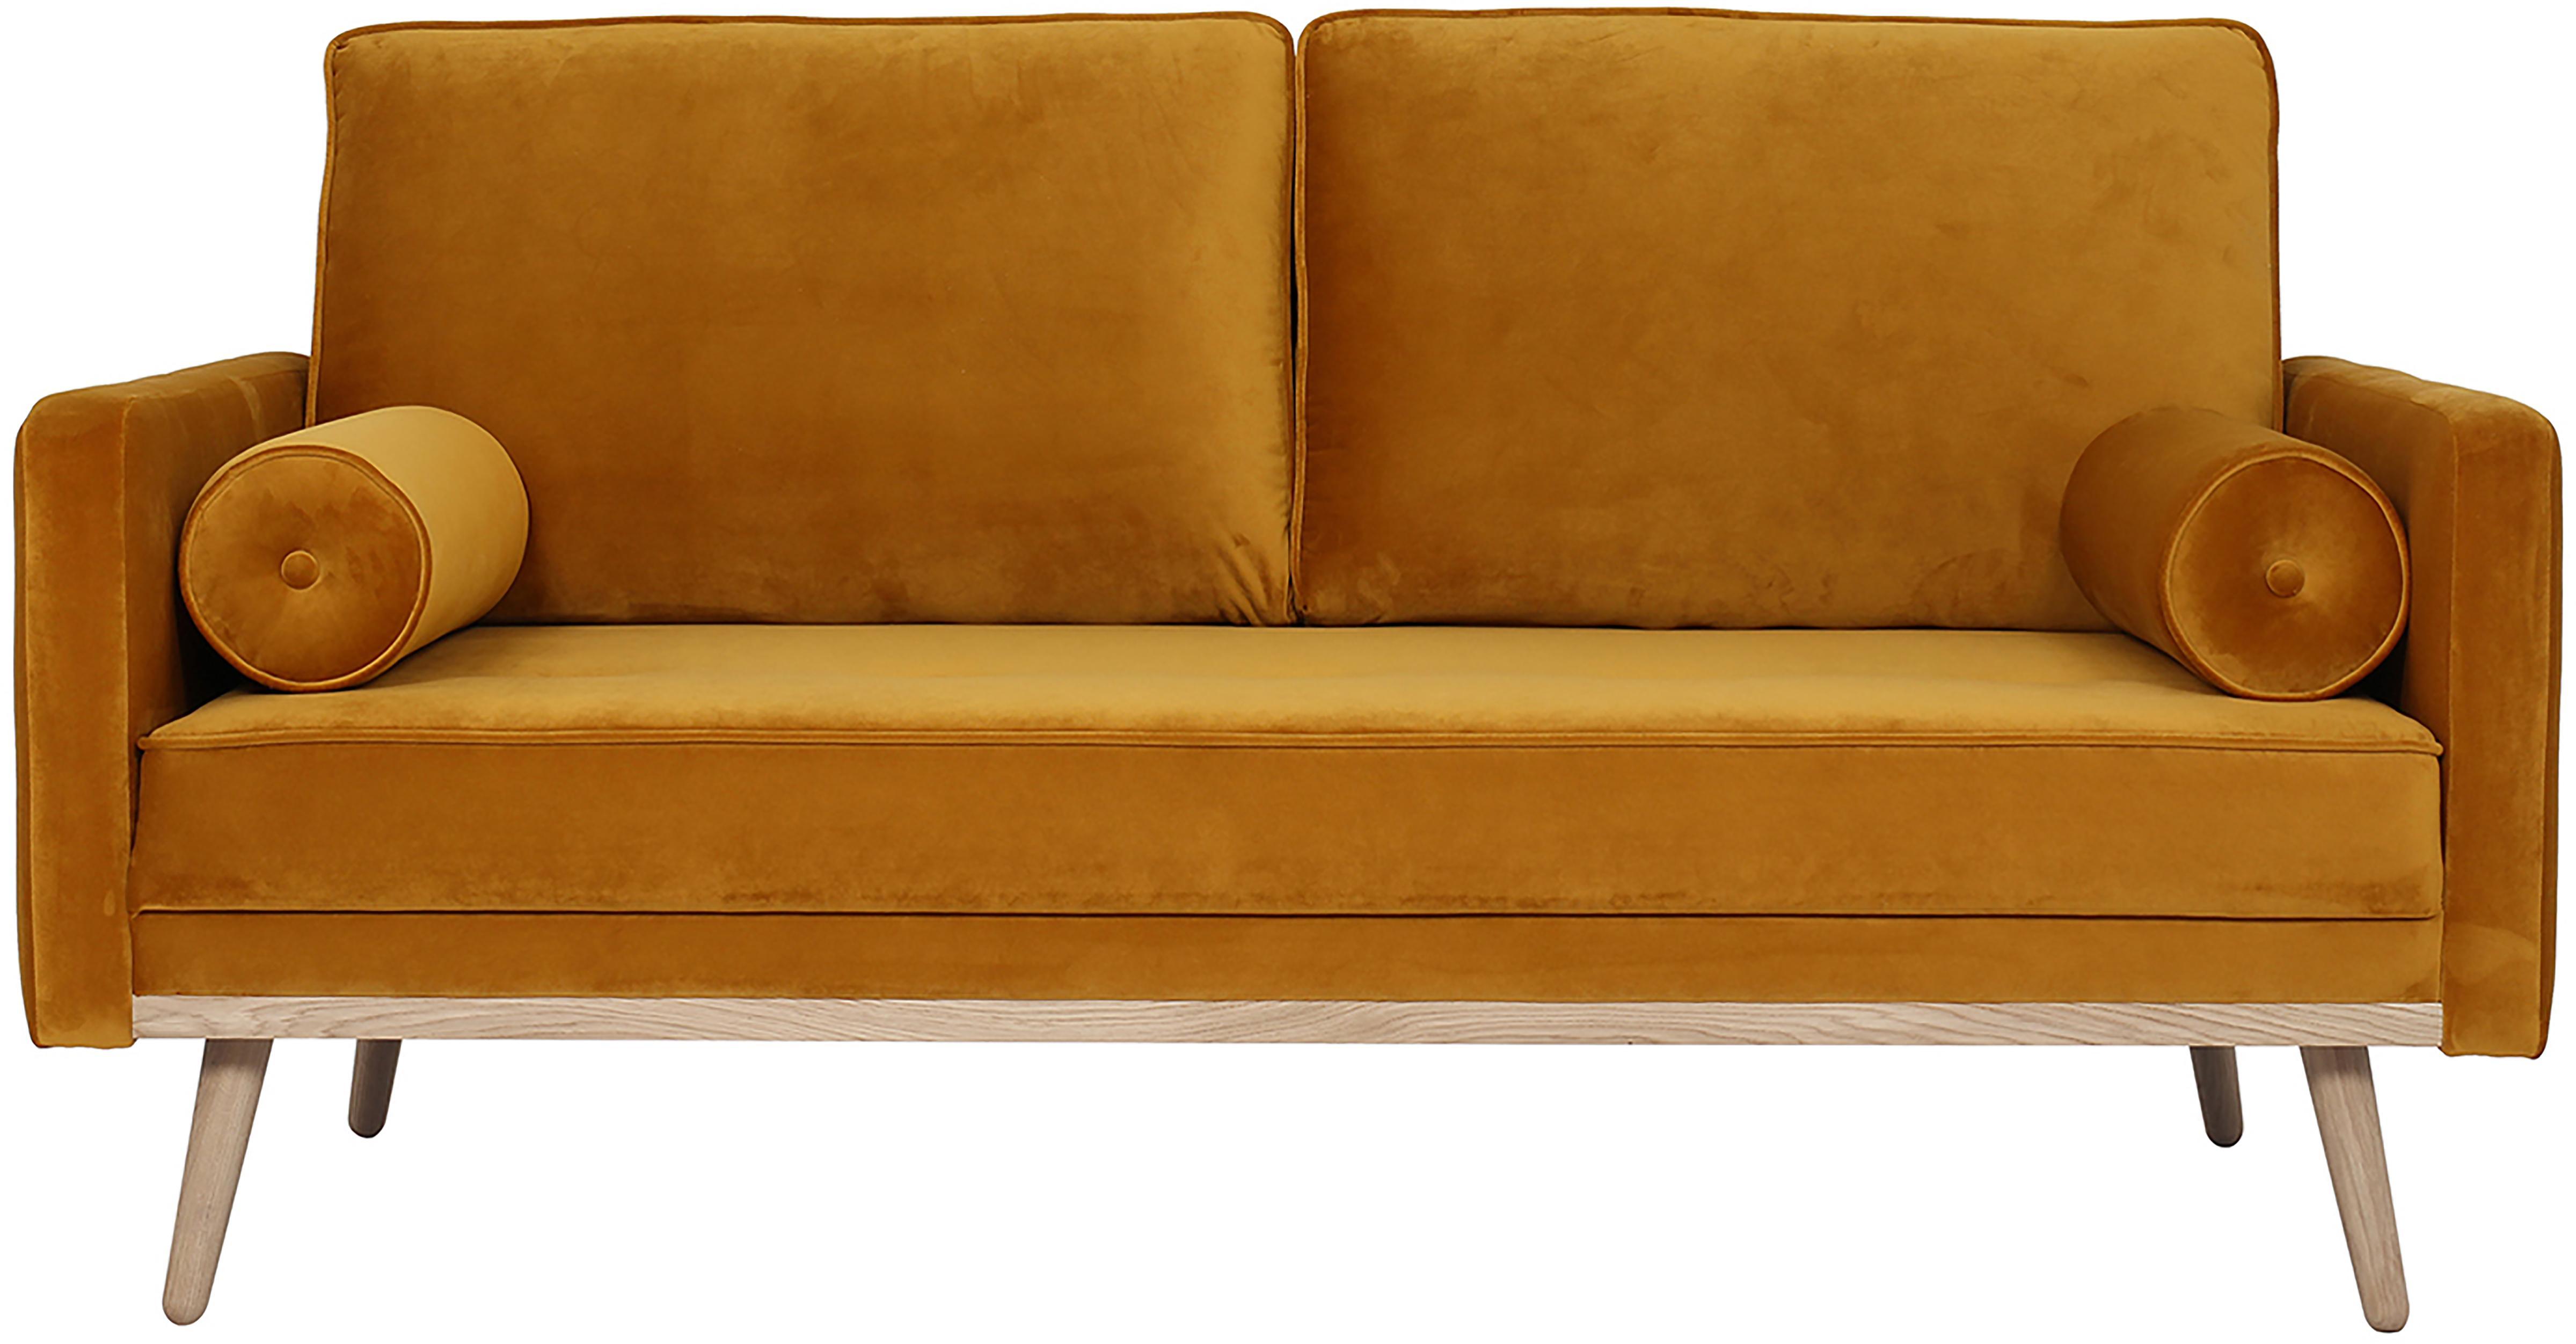 Samt-Sofa Saint (2-Sitzer), Bezug: Samt (Polyester) Der hoch, Gestell: Massives Eichenholz, Span, Samt Senfgelb, B 169 x T 87 cm